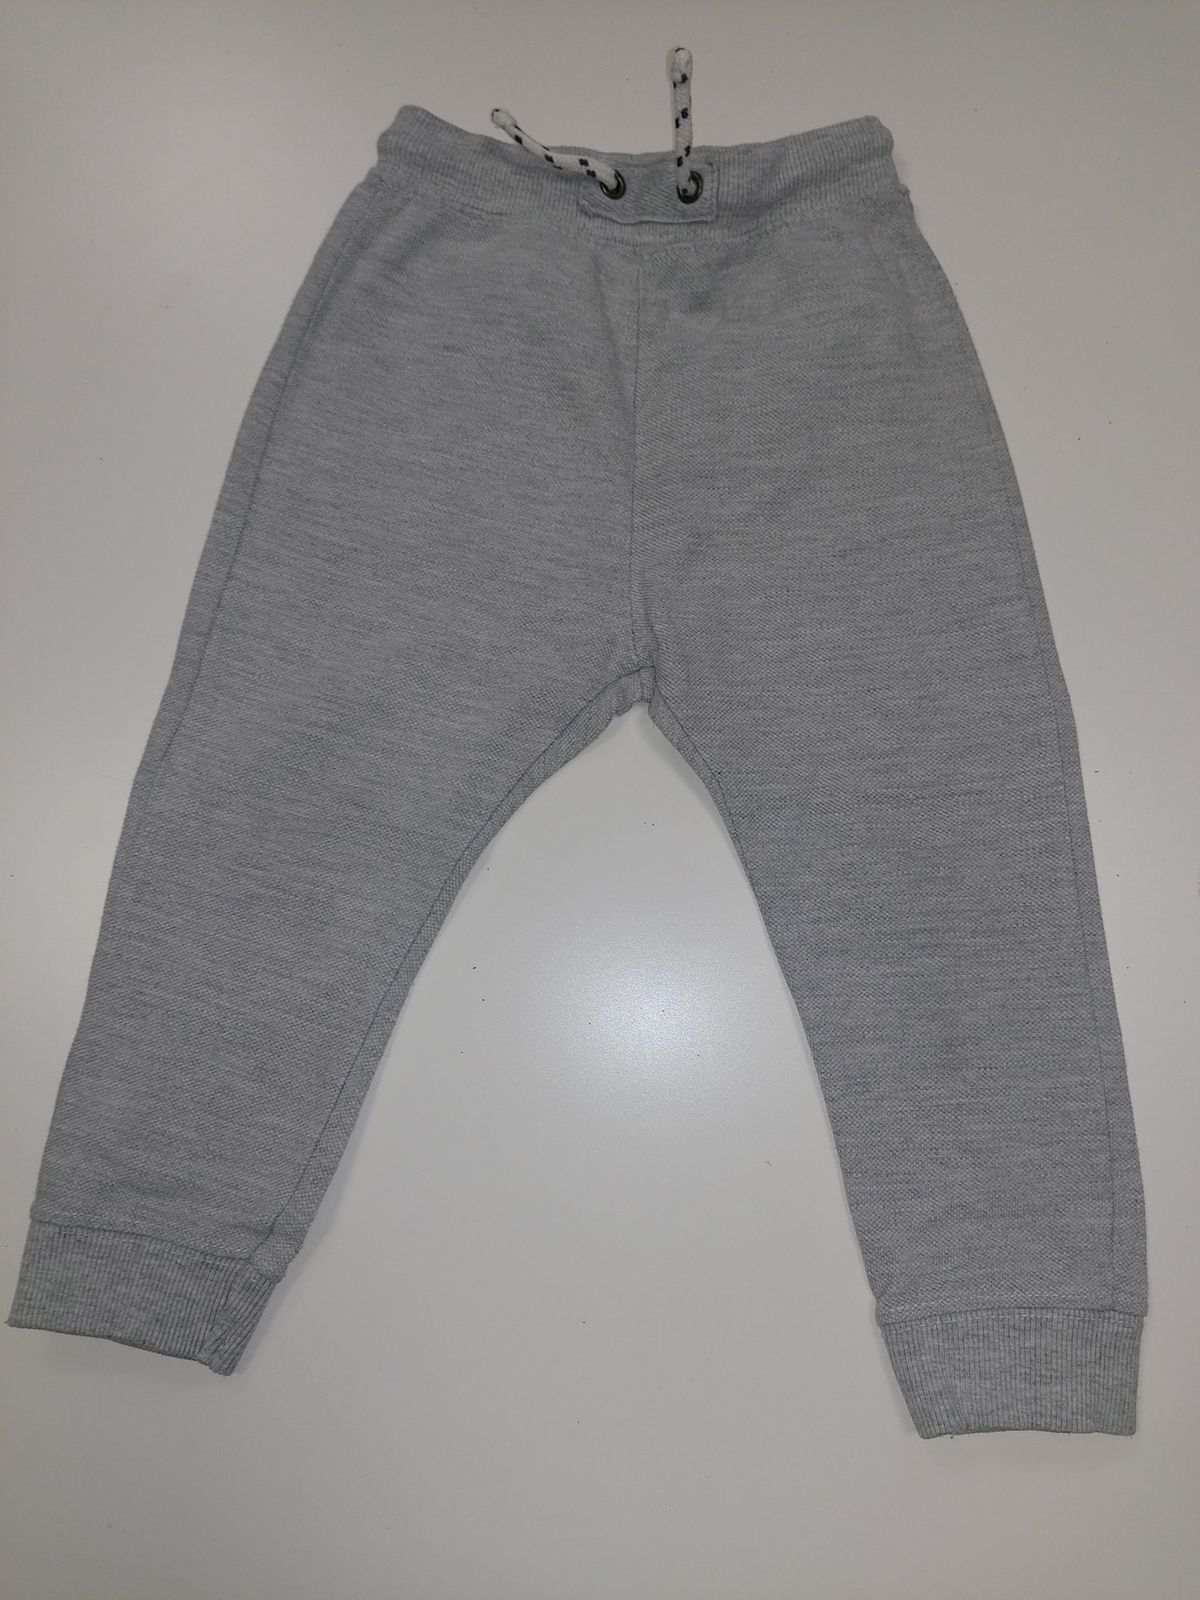 Zara Babyboy pantalone tuta grigio 18/24mesi € 7,90 13964